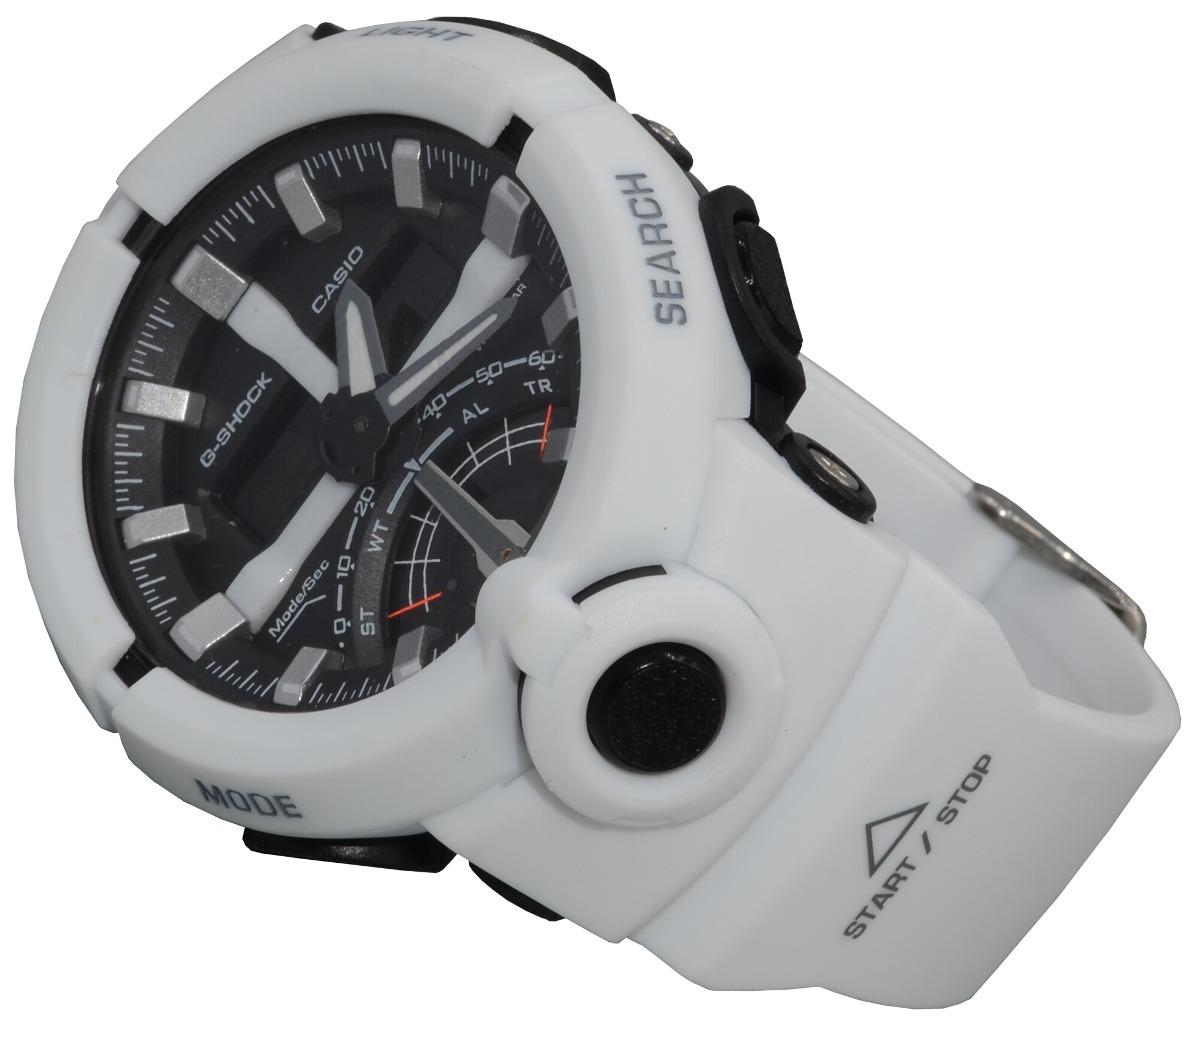 ec357ba3624 Relógio Masculino Casio G-shock Ga-500 Branco Lancamento!! - R  200 ...